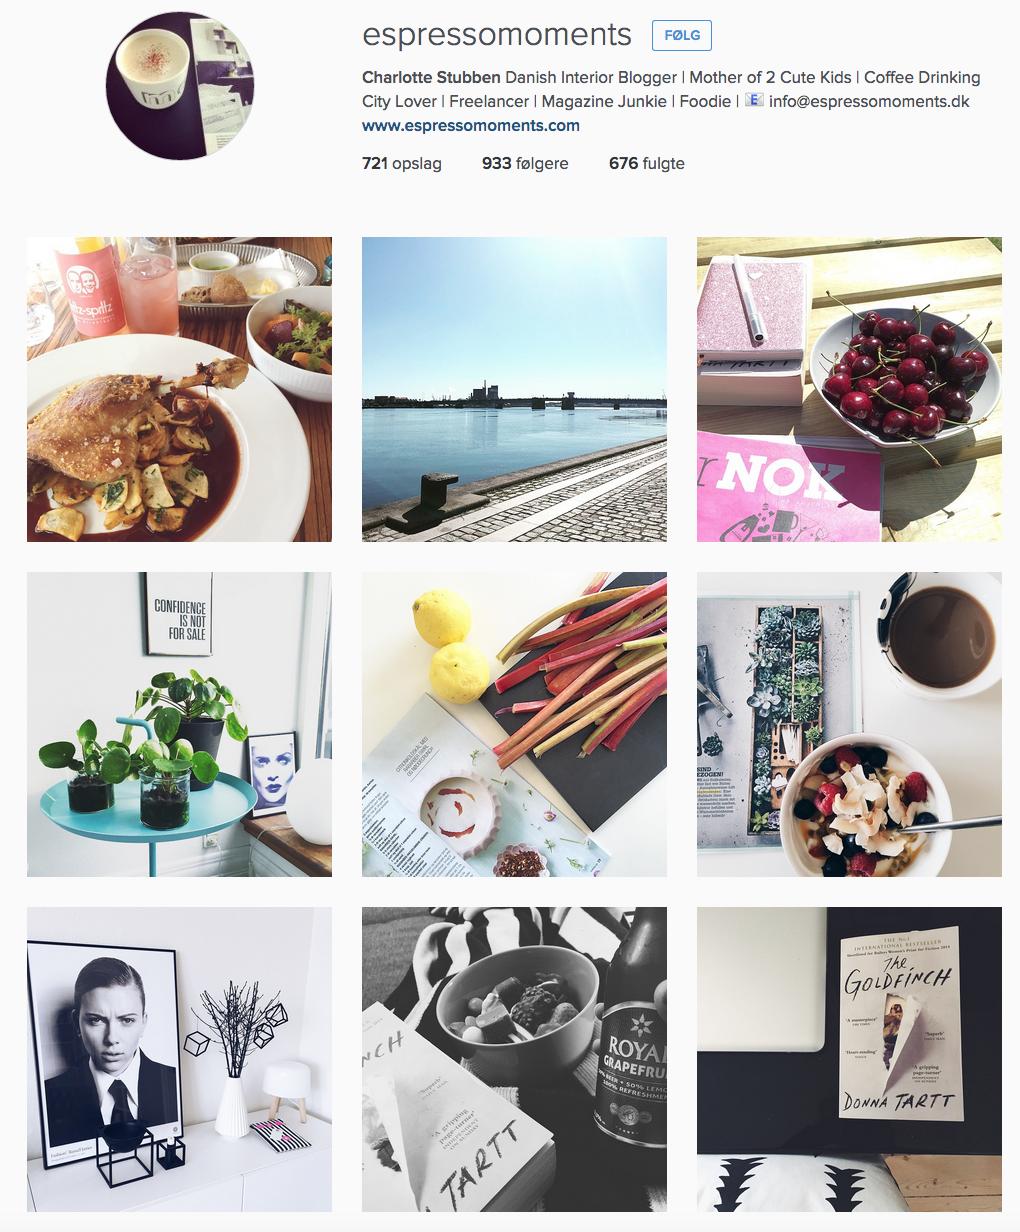 Espresso Moments on Instagram